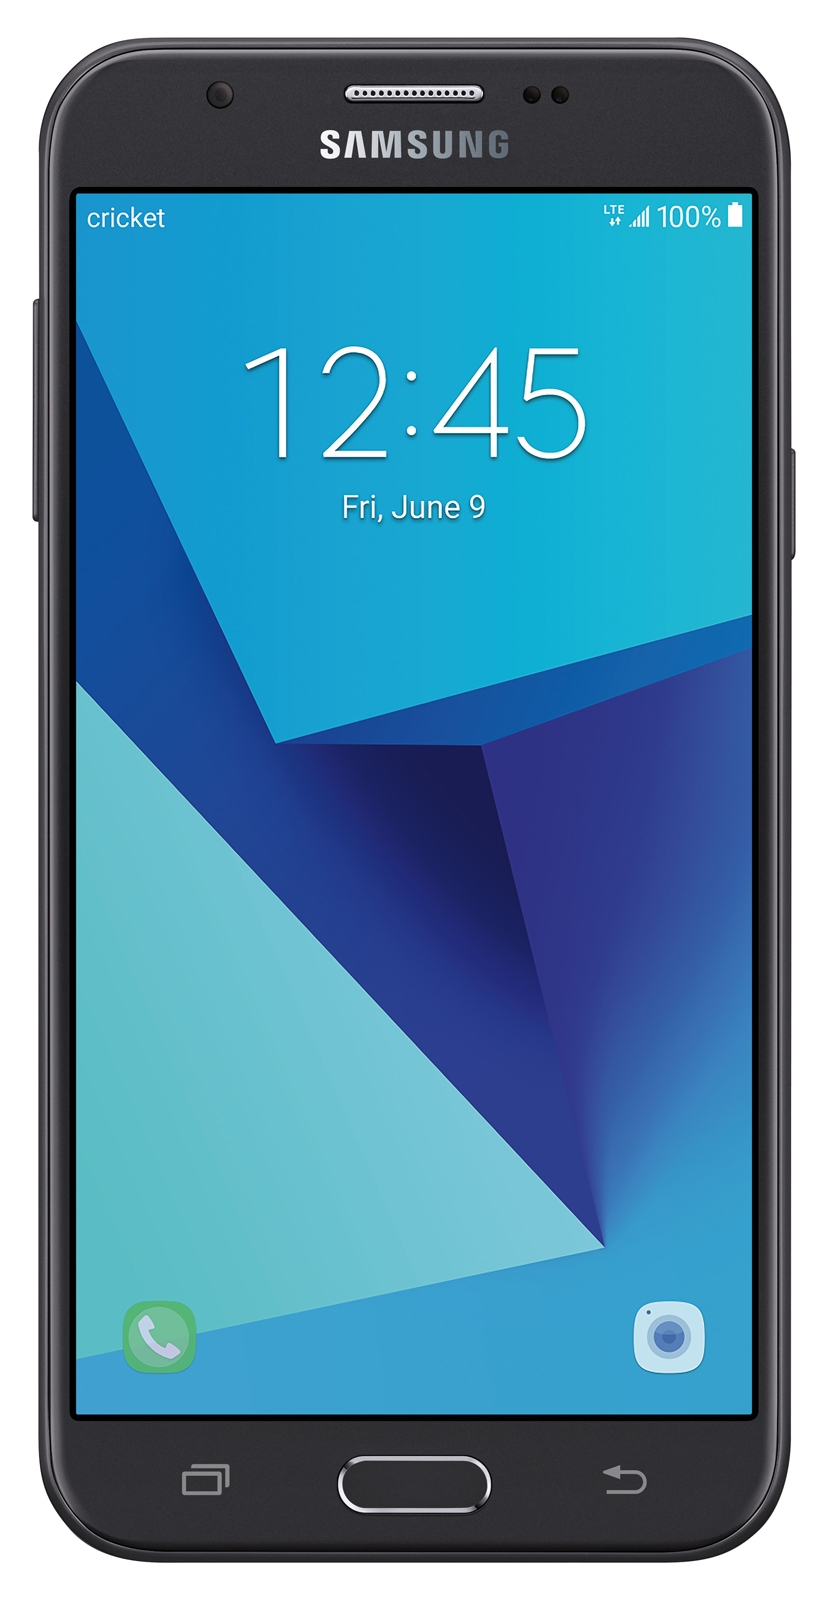 Galaxy Halo Cricket Phones Sm J727azkzaio Samsung Us